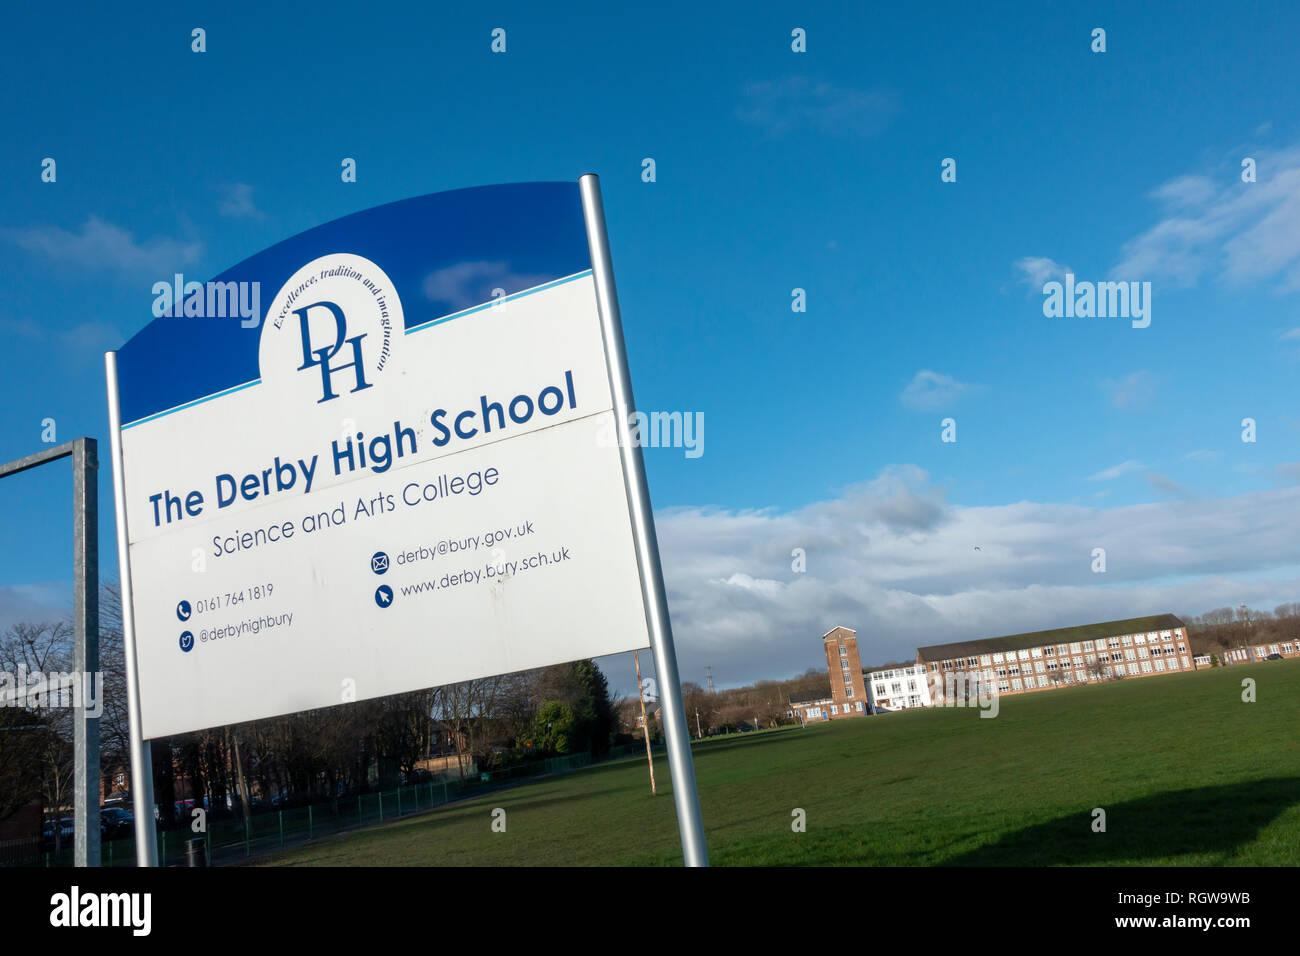 Derby High School in Bury, Lancashire. - Stock Image